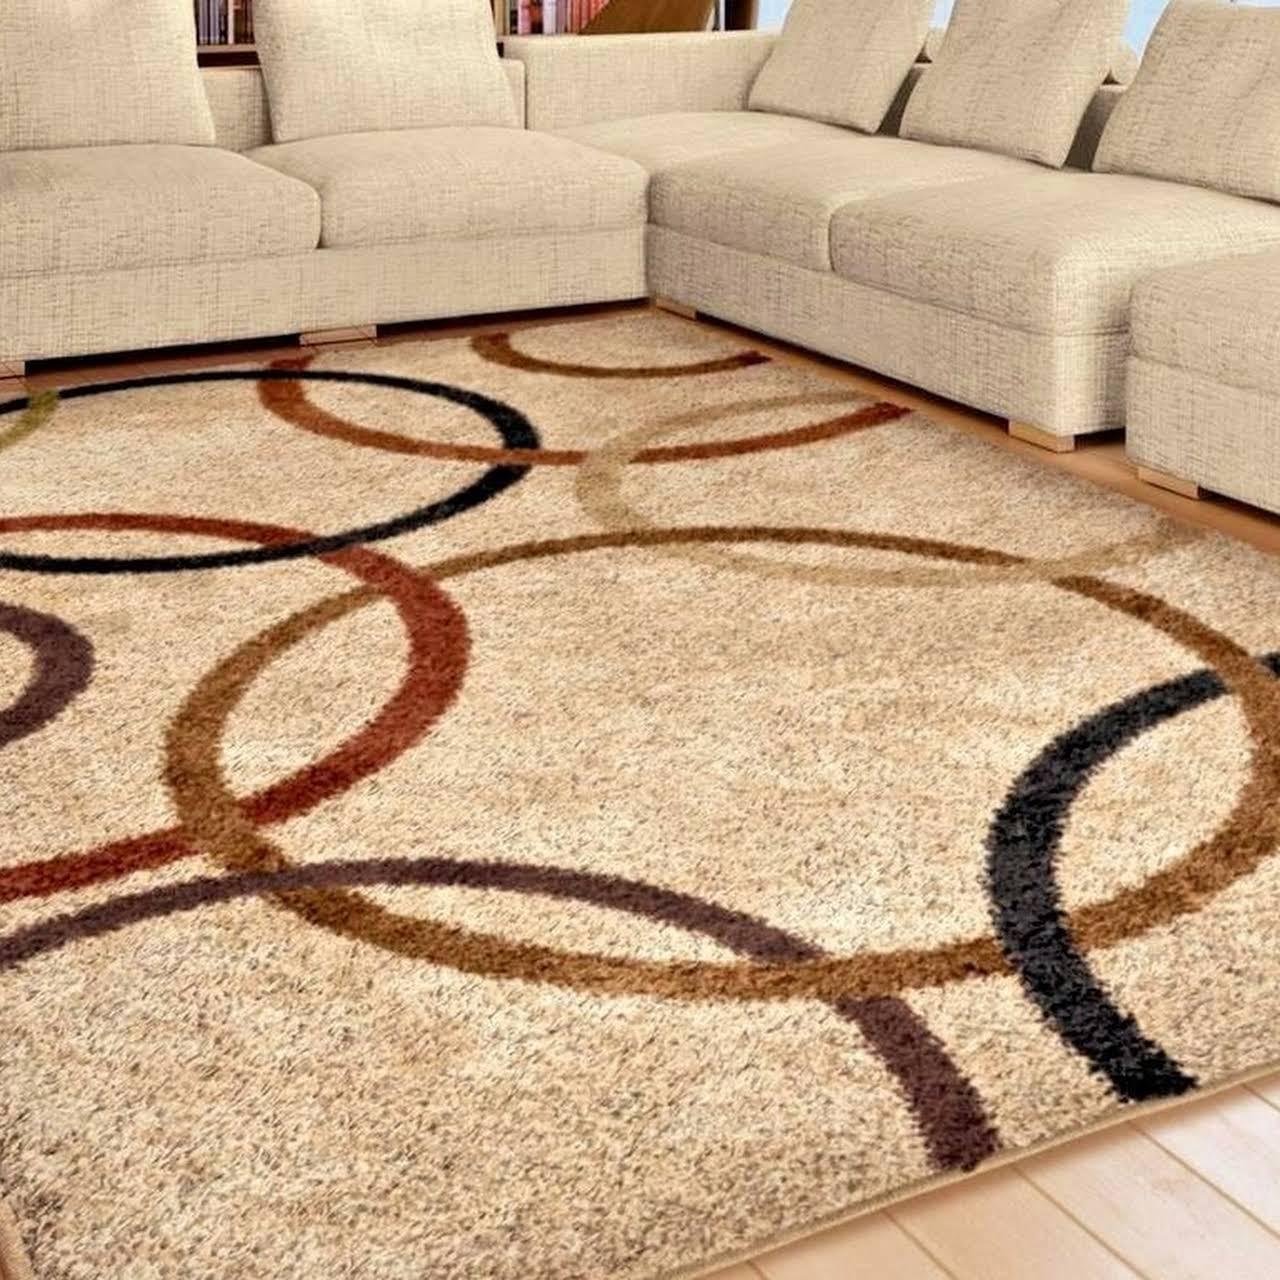 Frankdona Global Resources Carpets